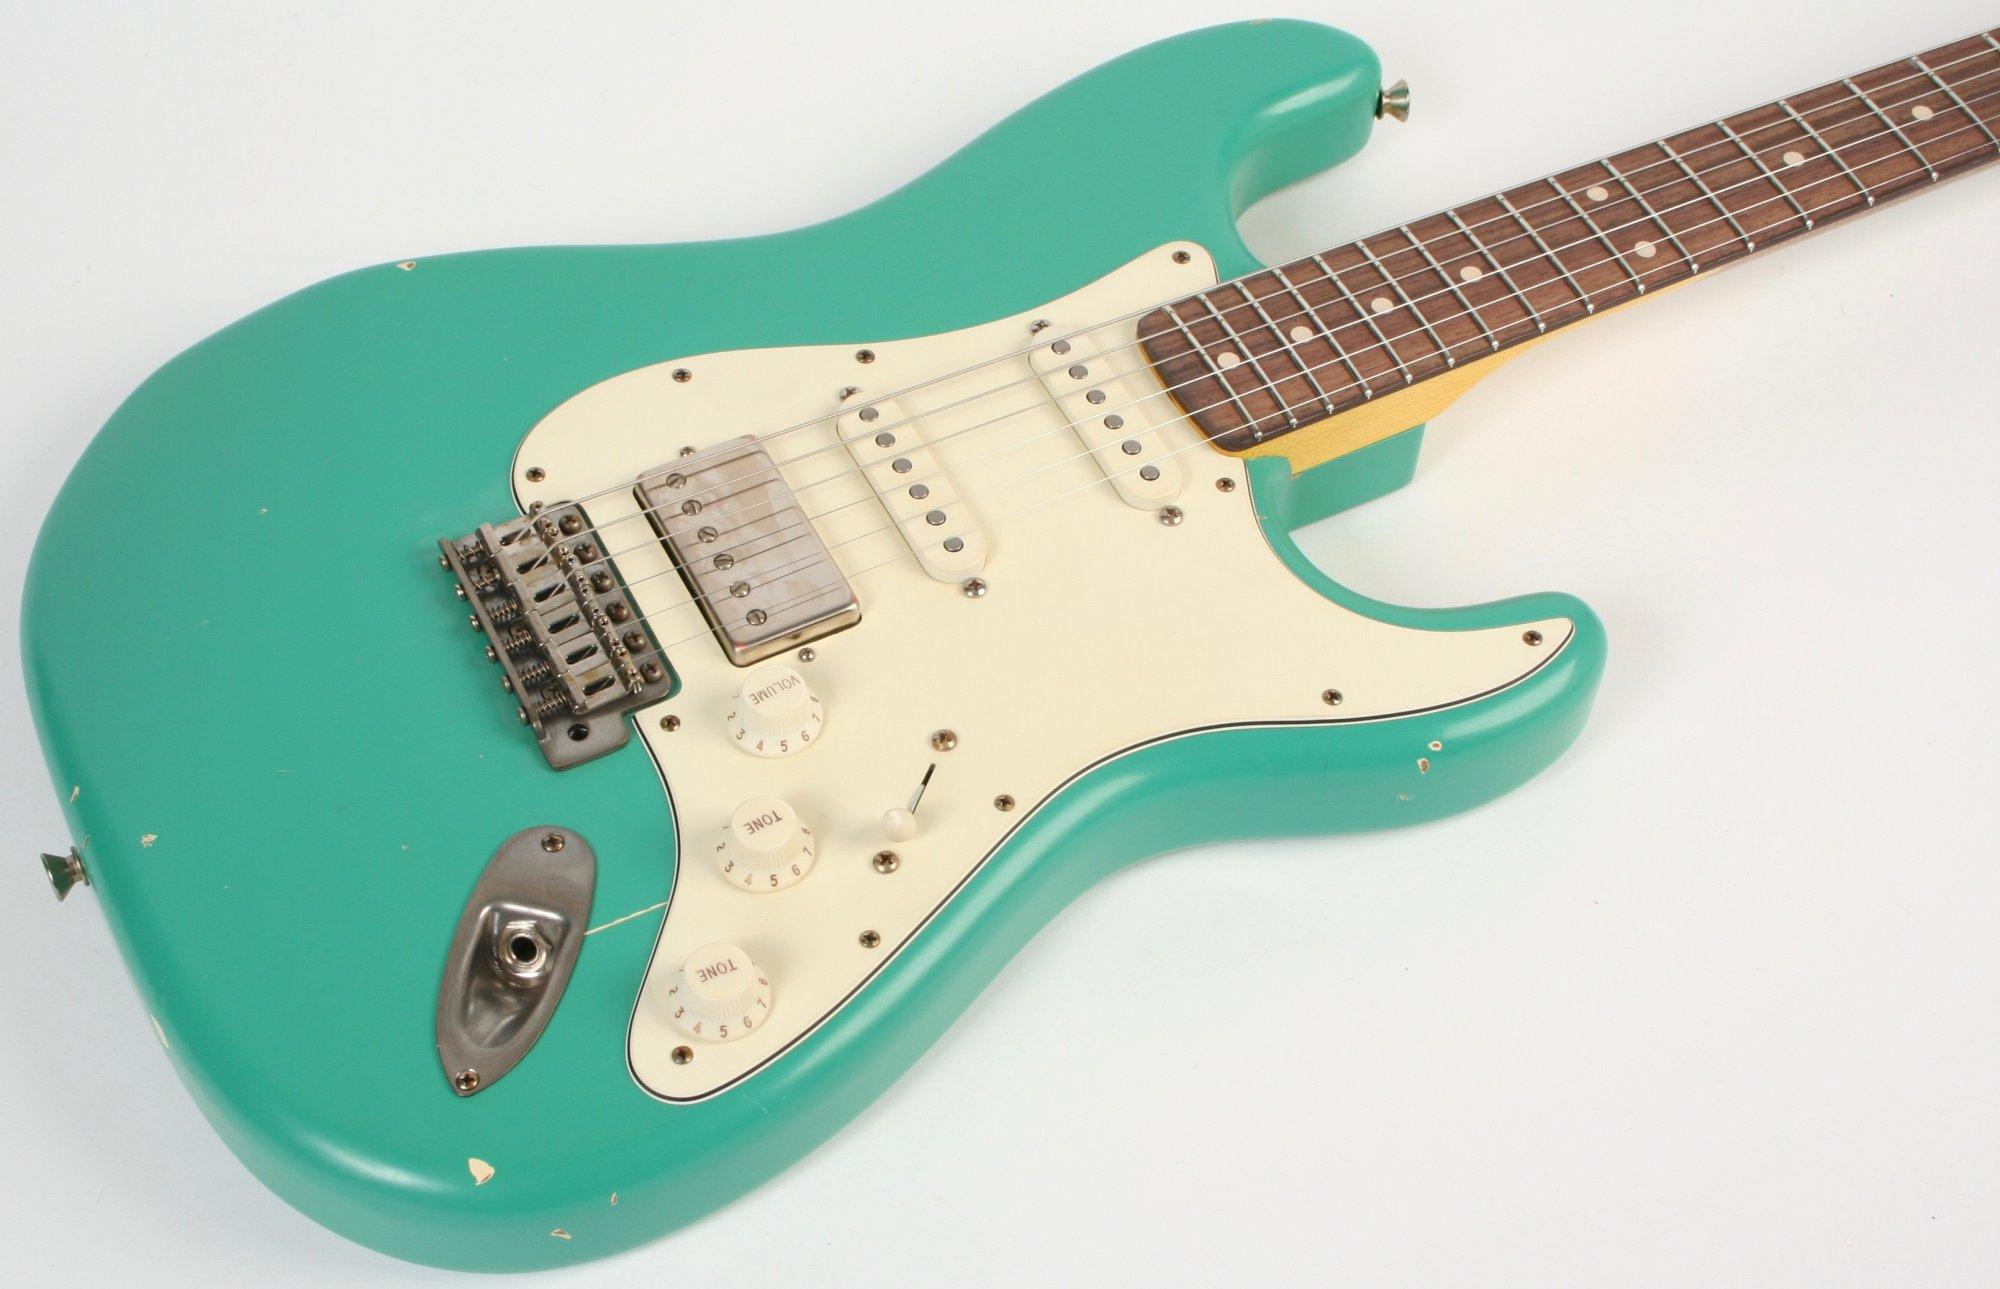 Nash Guitars S-67 HSS Seafoam Green